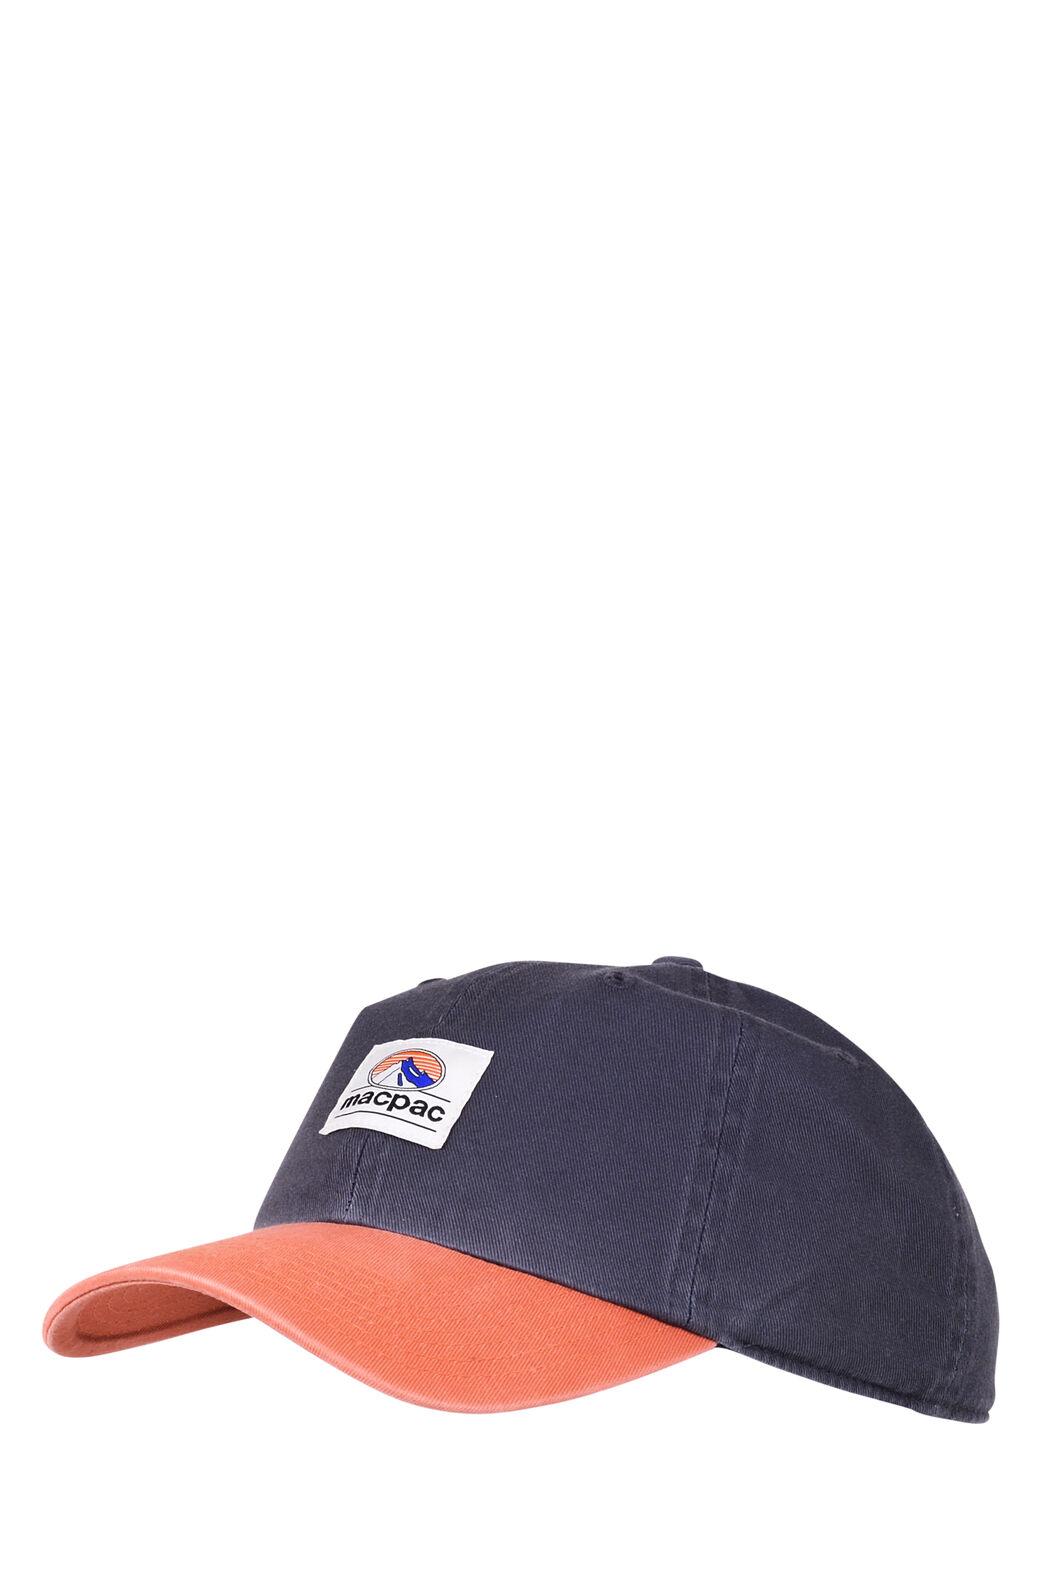 Macpac Vintage Cap, Charcoal/Orange Patch, hi-res